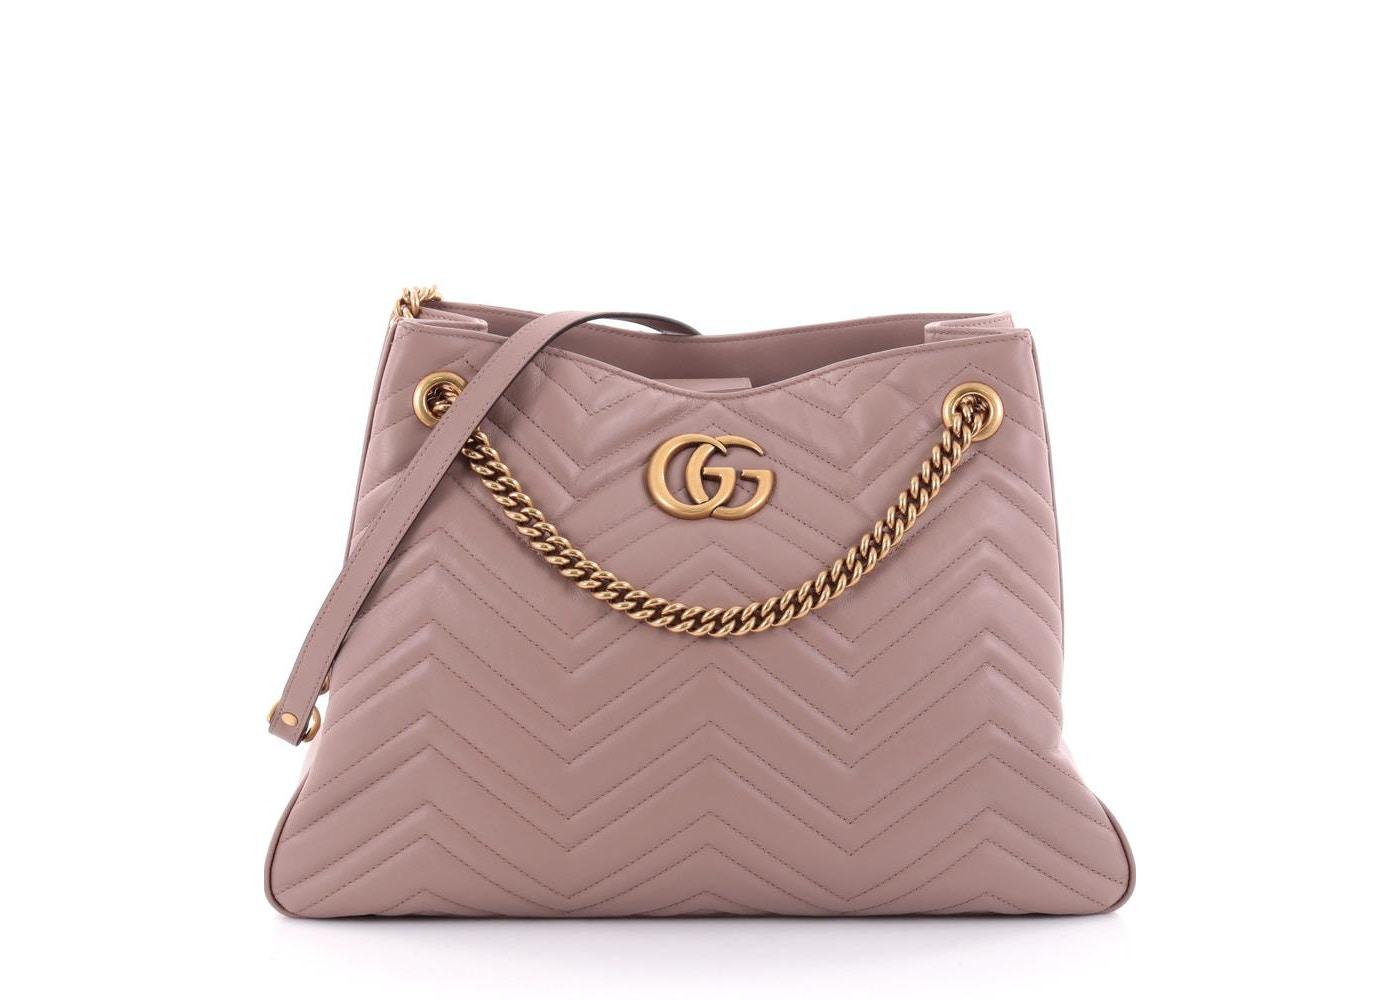 74dac840093d Gucci Marmont Chain Shoulder Bag Matelasse Taupe. Matelasse Taupe